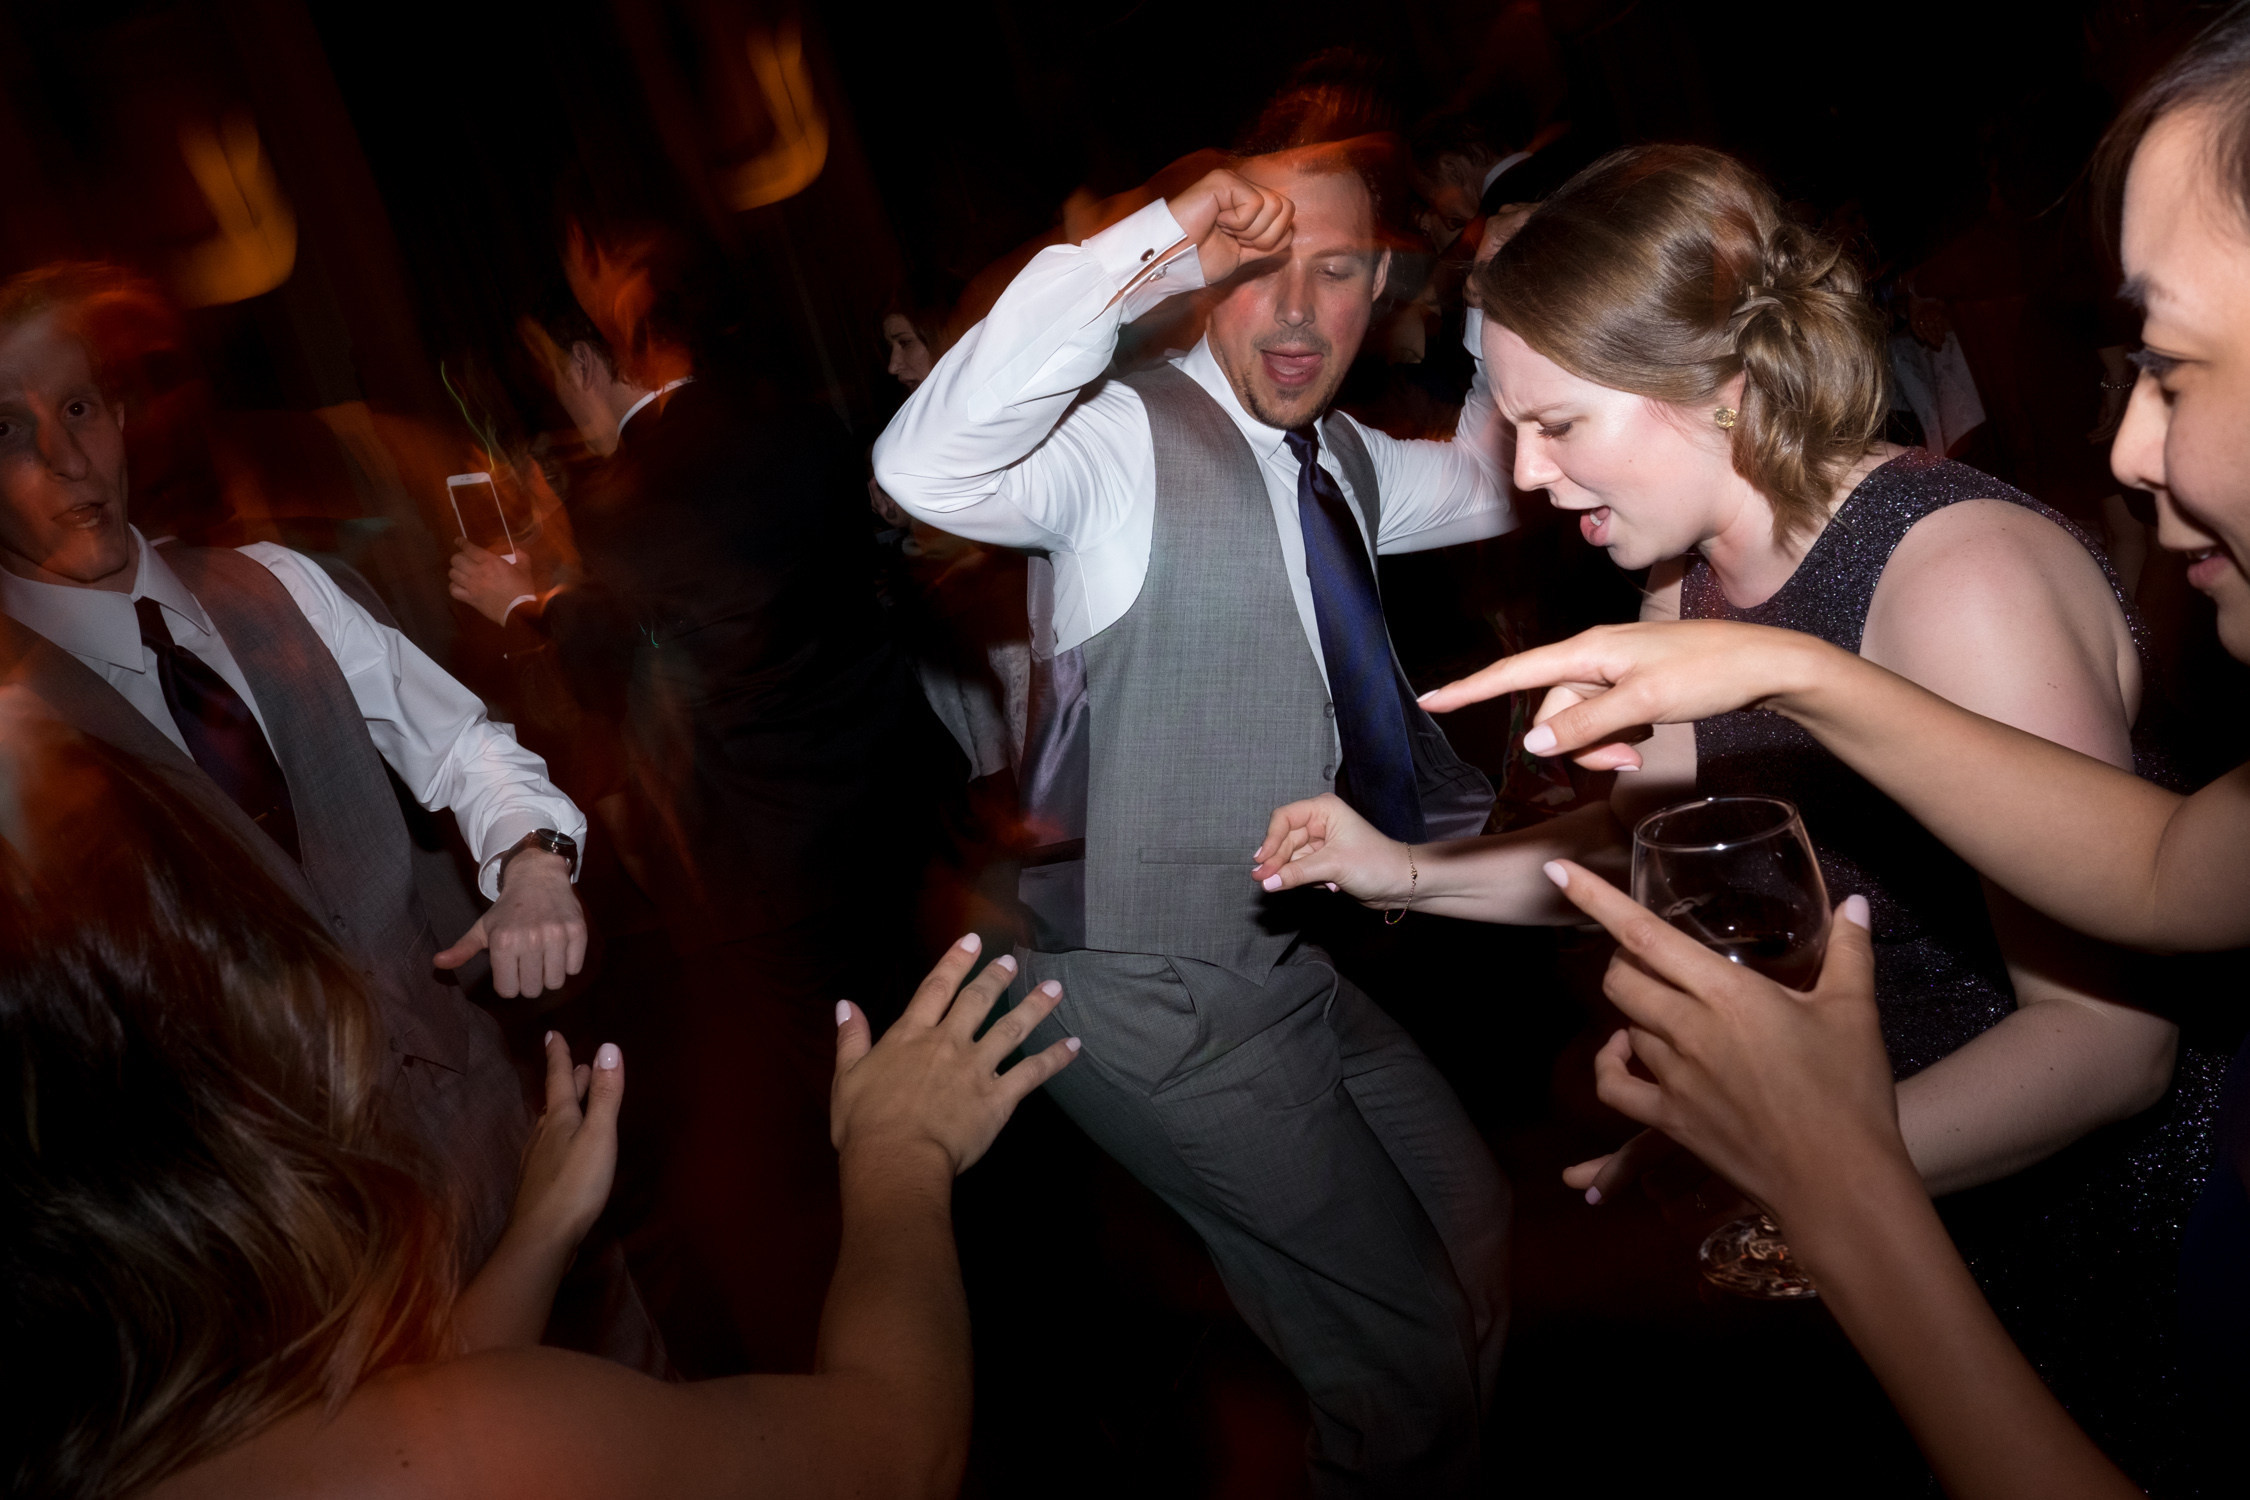 toronto_liberty_grand_wedding-014.jpg